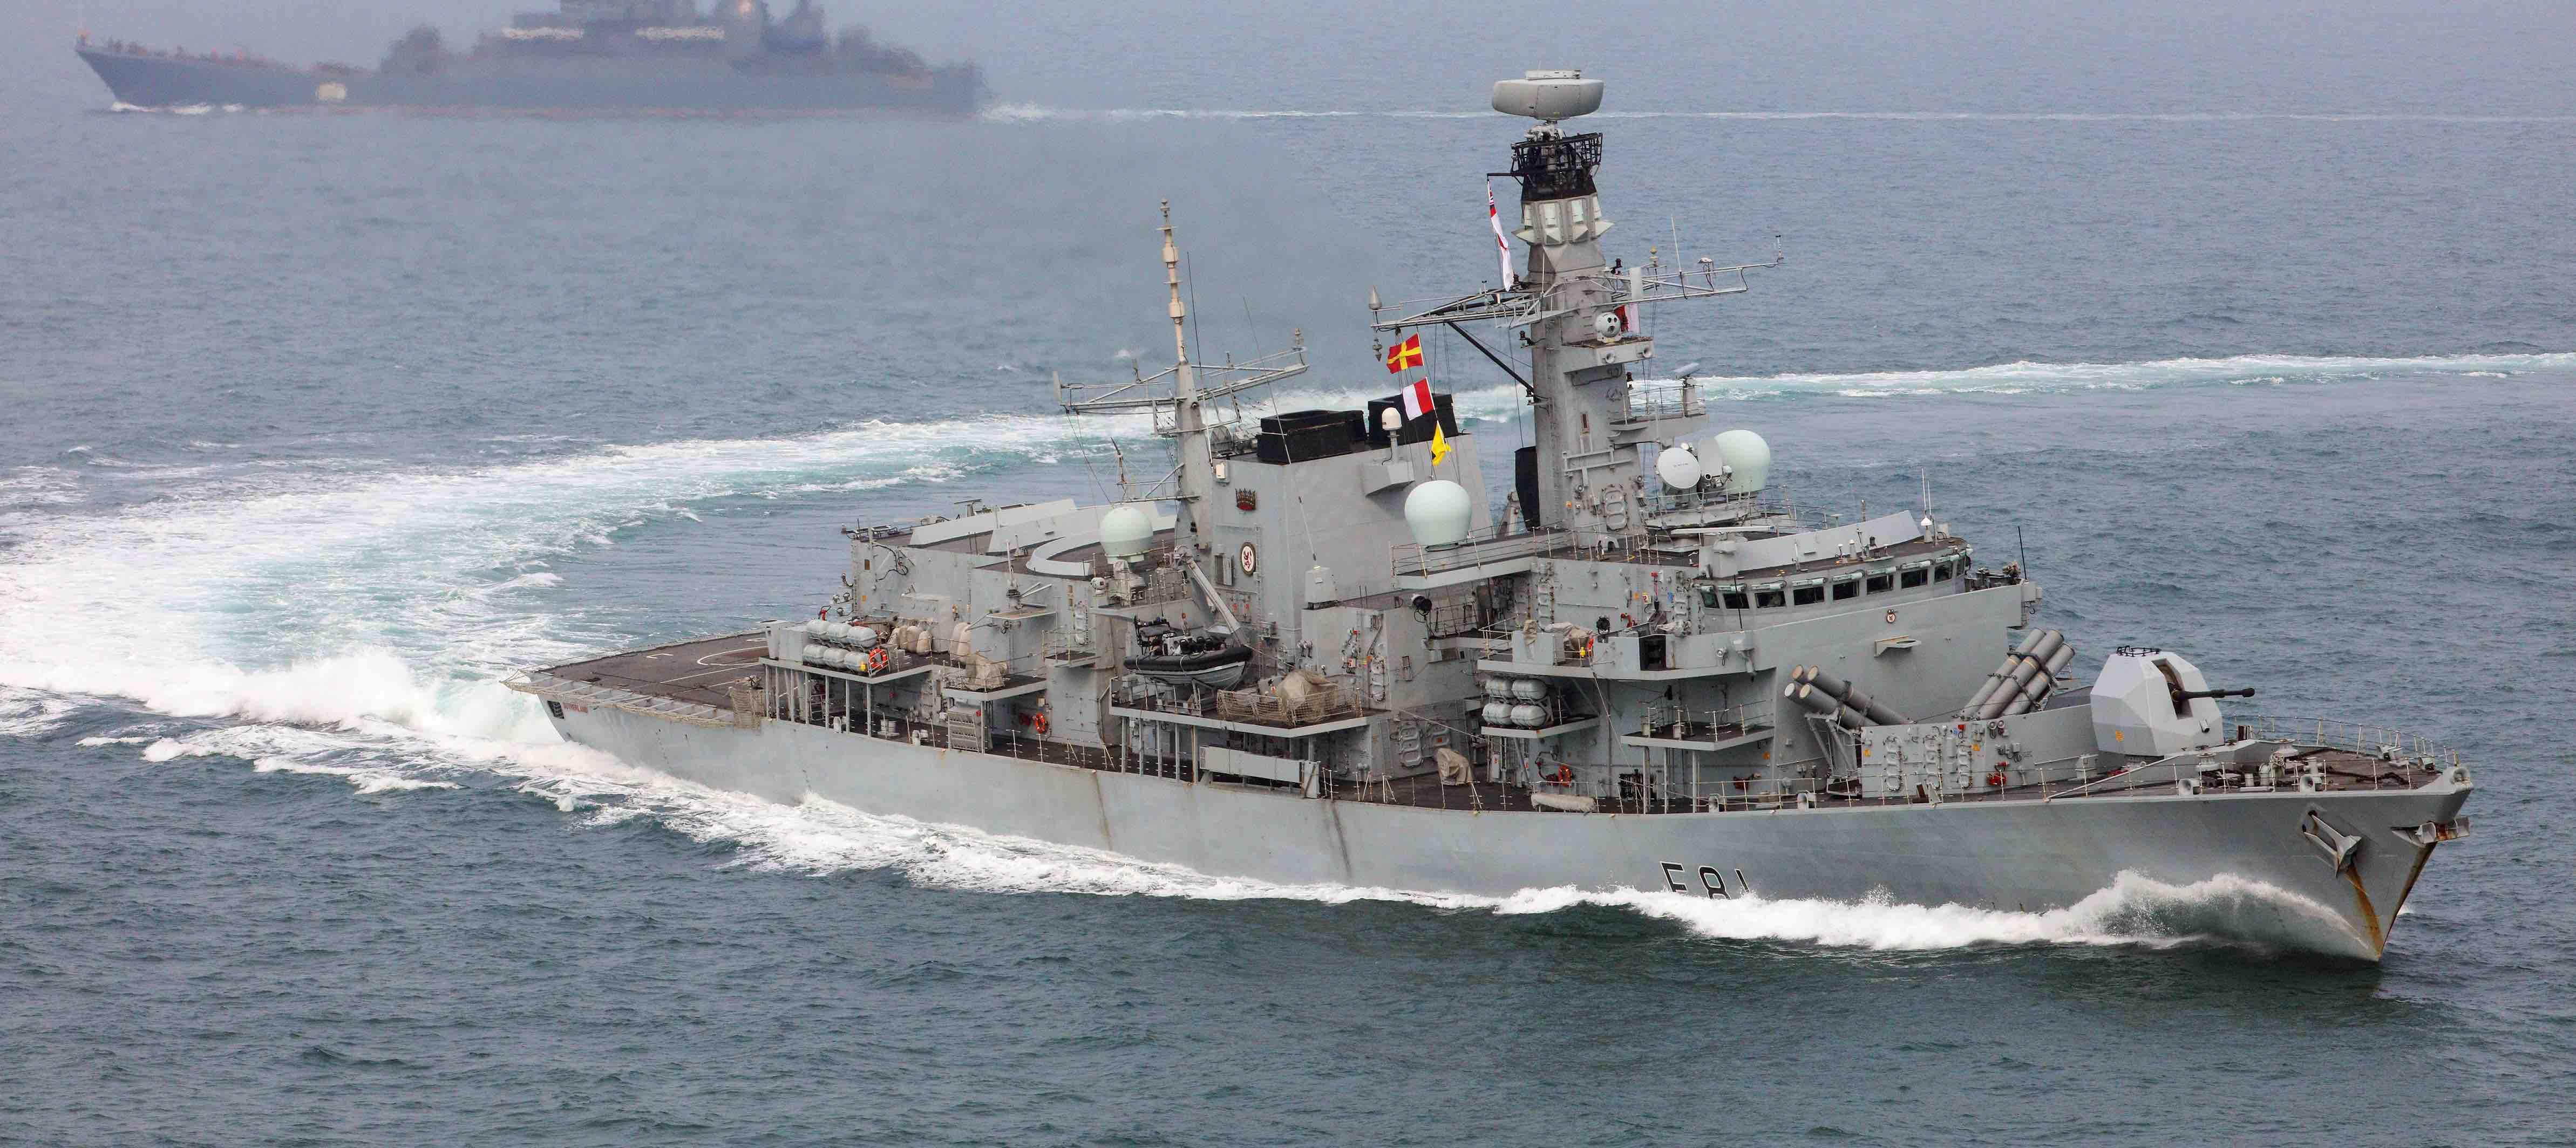 HMS Sutherland on patrol (Photo: Ministry of Defence, UK)